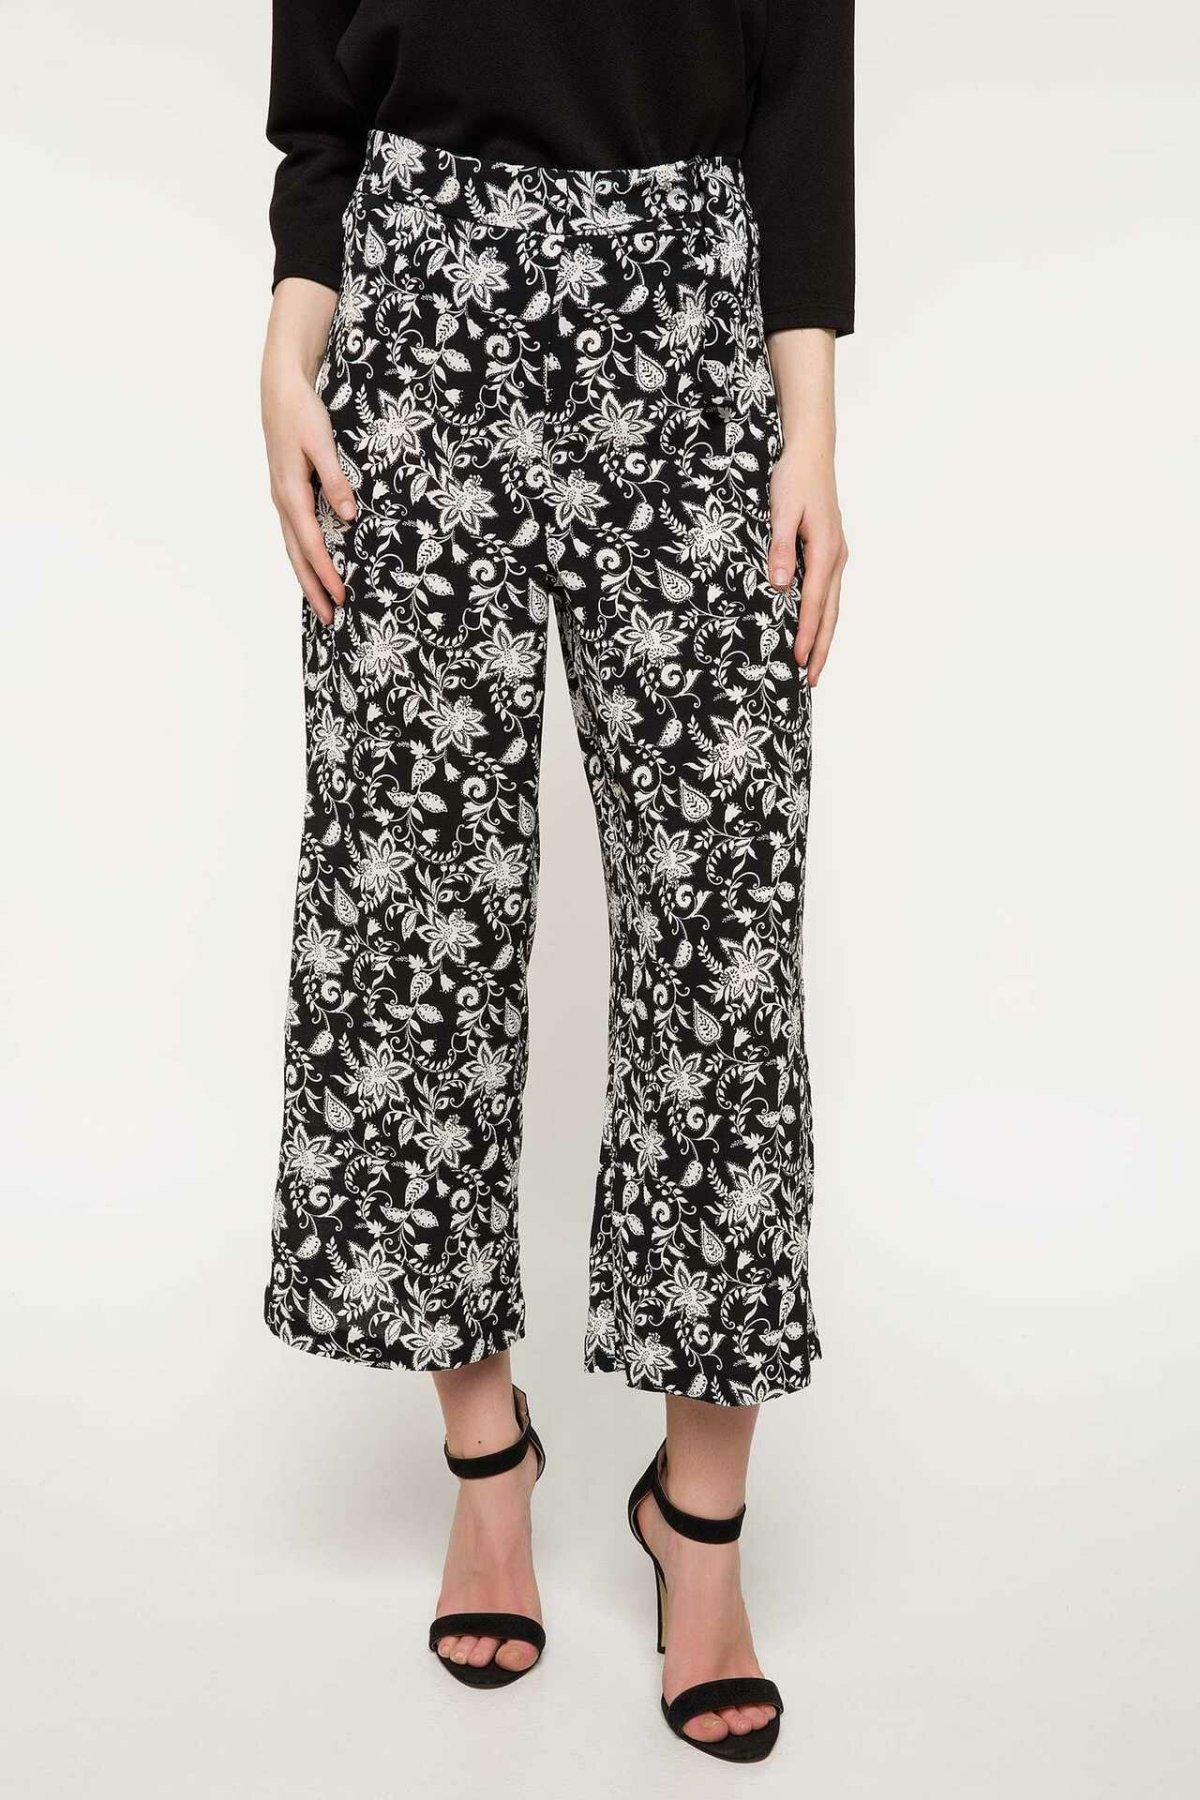 DeFacto Spring Stylish Wide Leg Pants Women Casual White Black Striped Floral Prints Loose Bottoms Women Trousers-I9923AZ18SP